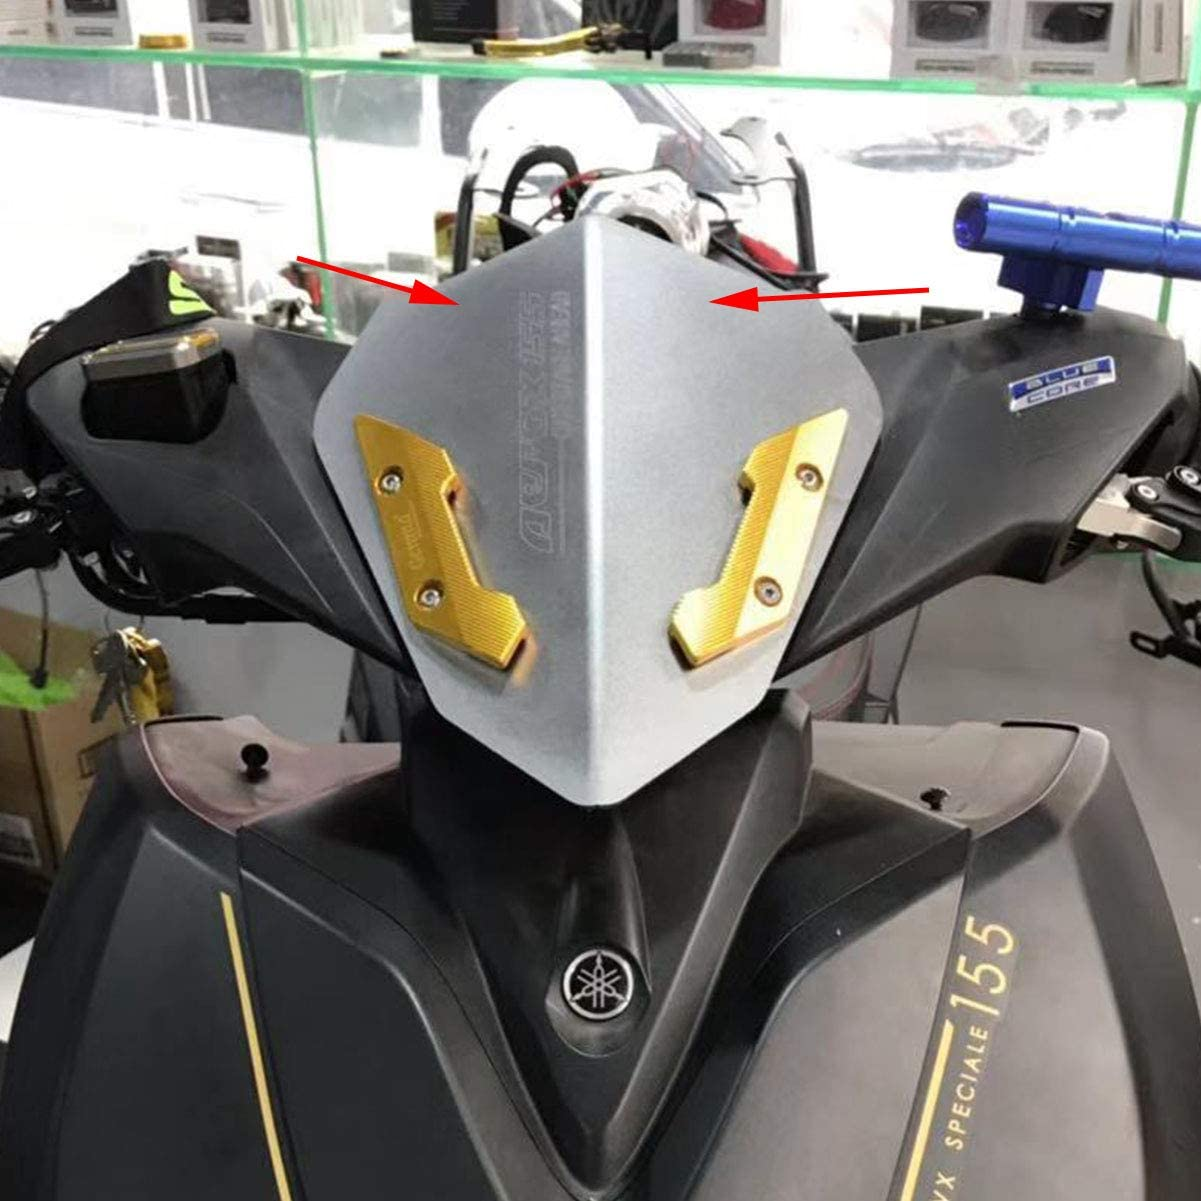 Semspeed Windshield For Yamaha NVX155 2017 2018 Aerox 155 2018 2017 NVX 155 Aerox155 Windscreen Air Deflector Scooter AEROX 155 NVX 155 Black